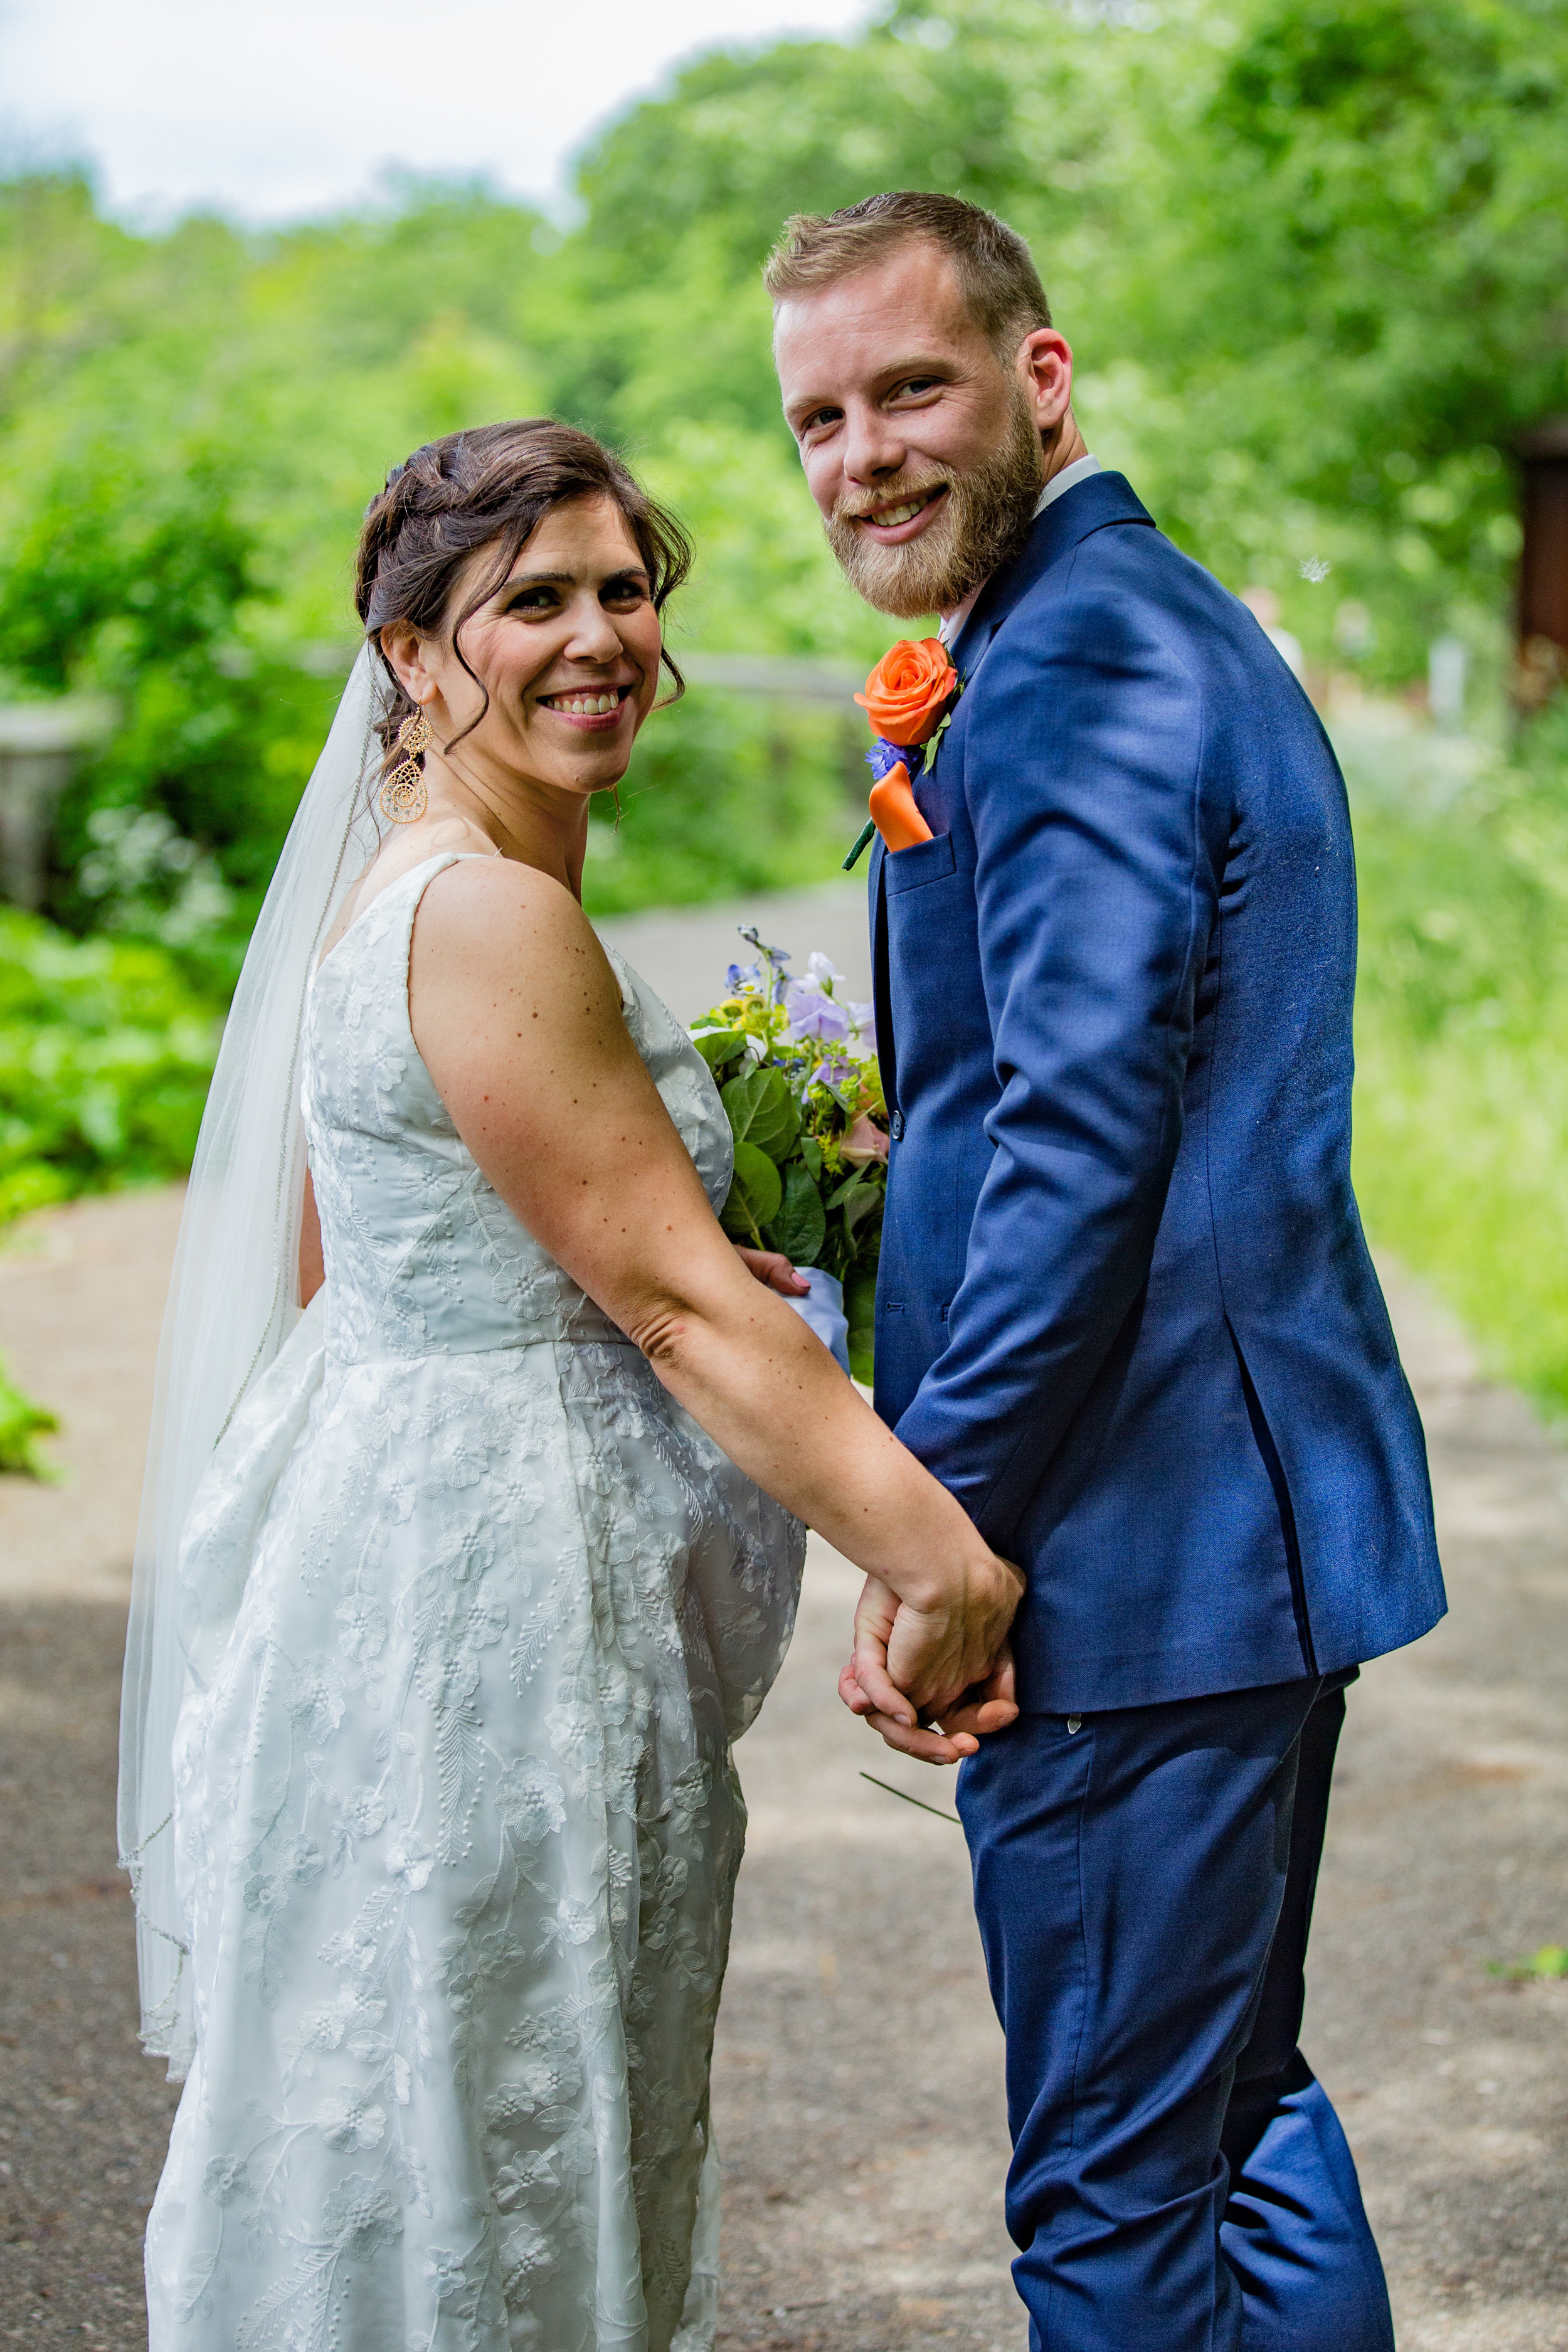 Natalie and Dallas Mooney Wedding 6-8-19_Tania Watt Photography-216.jpg